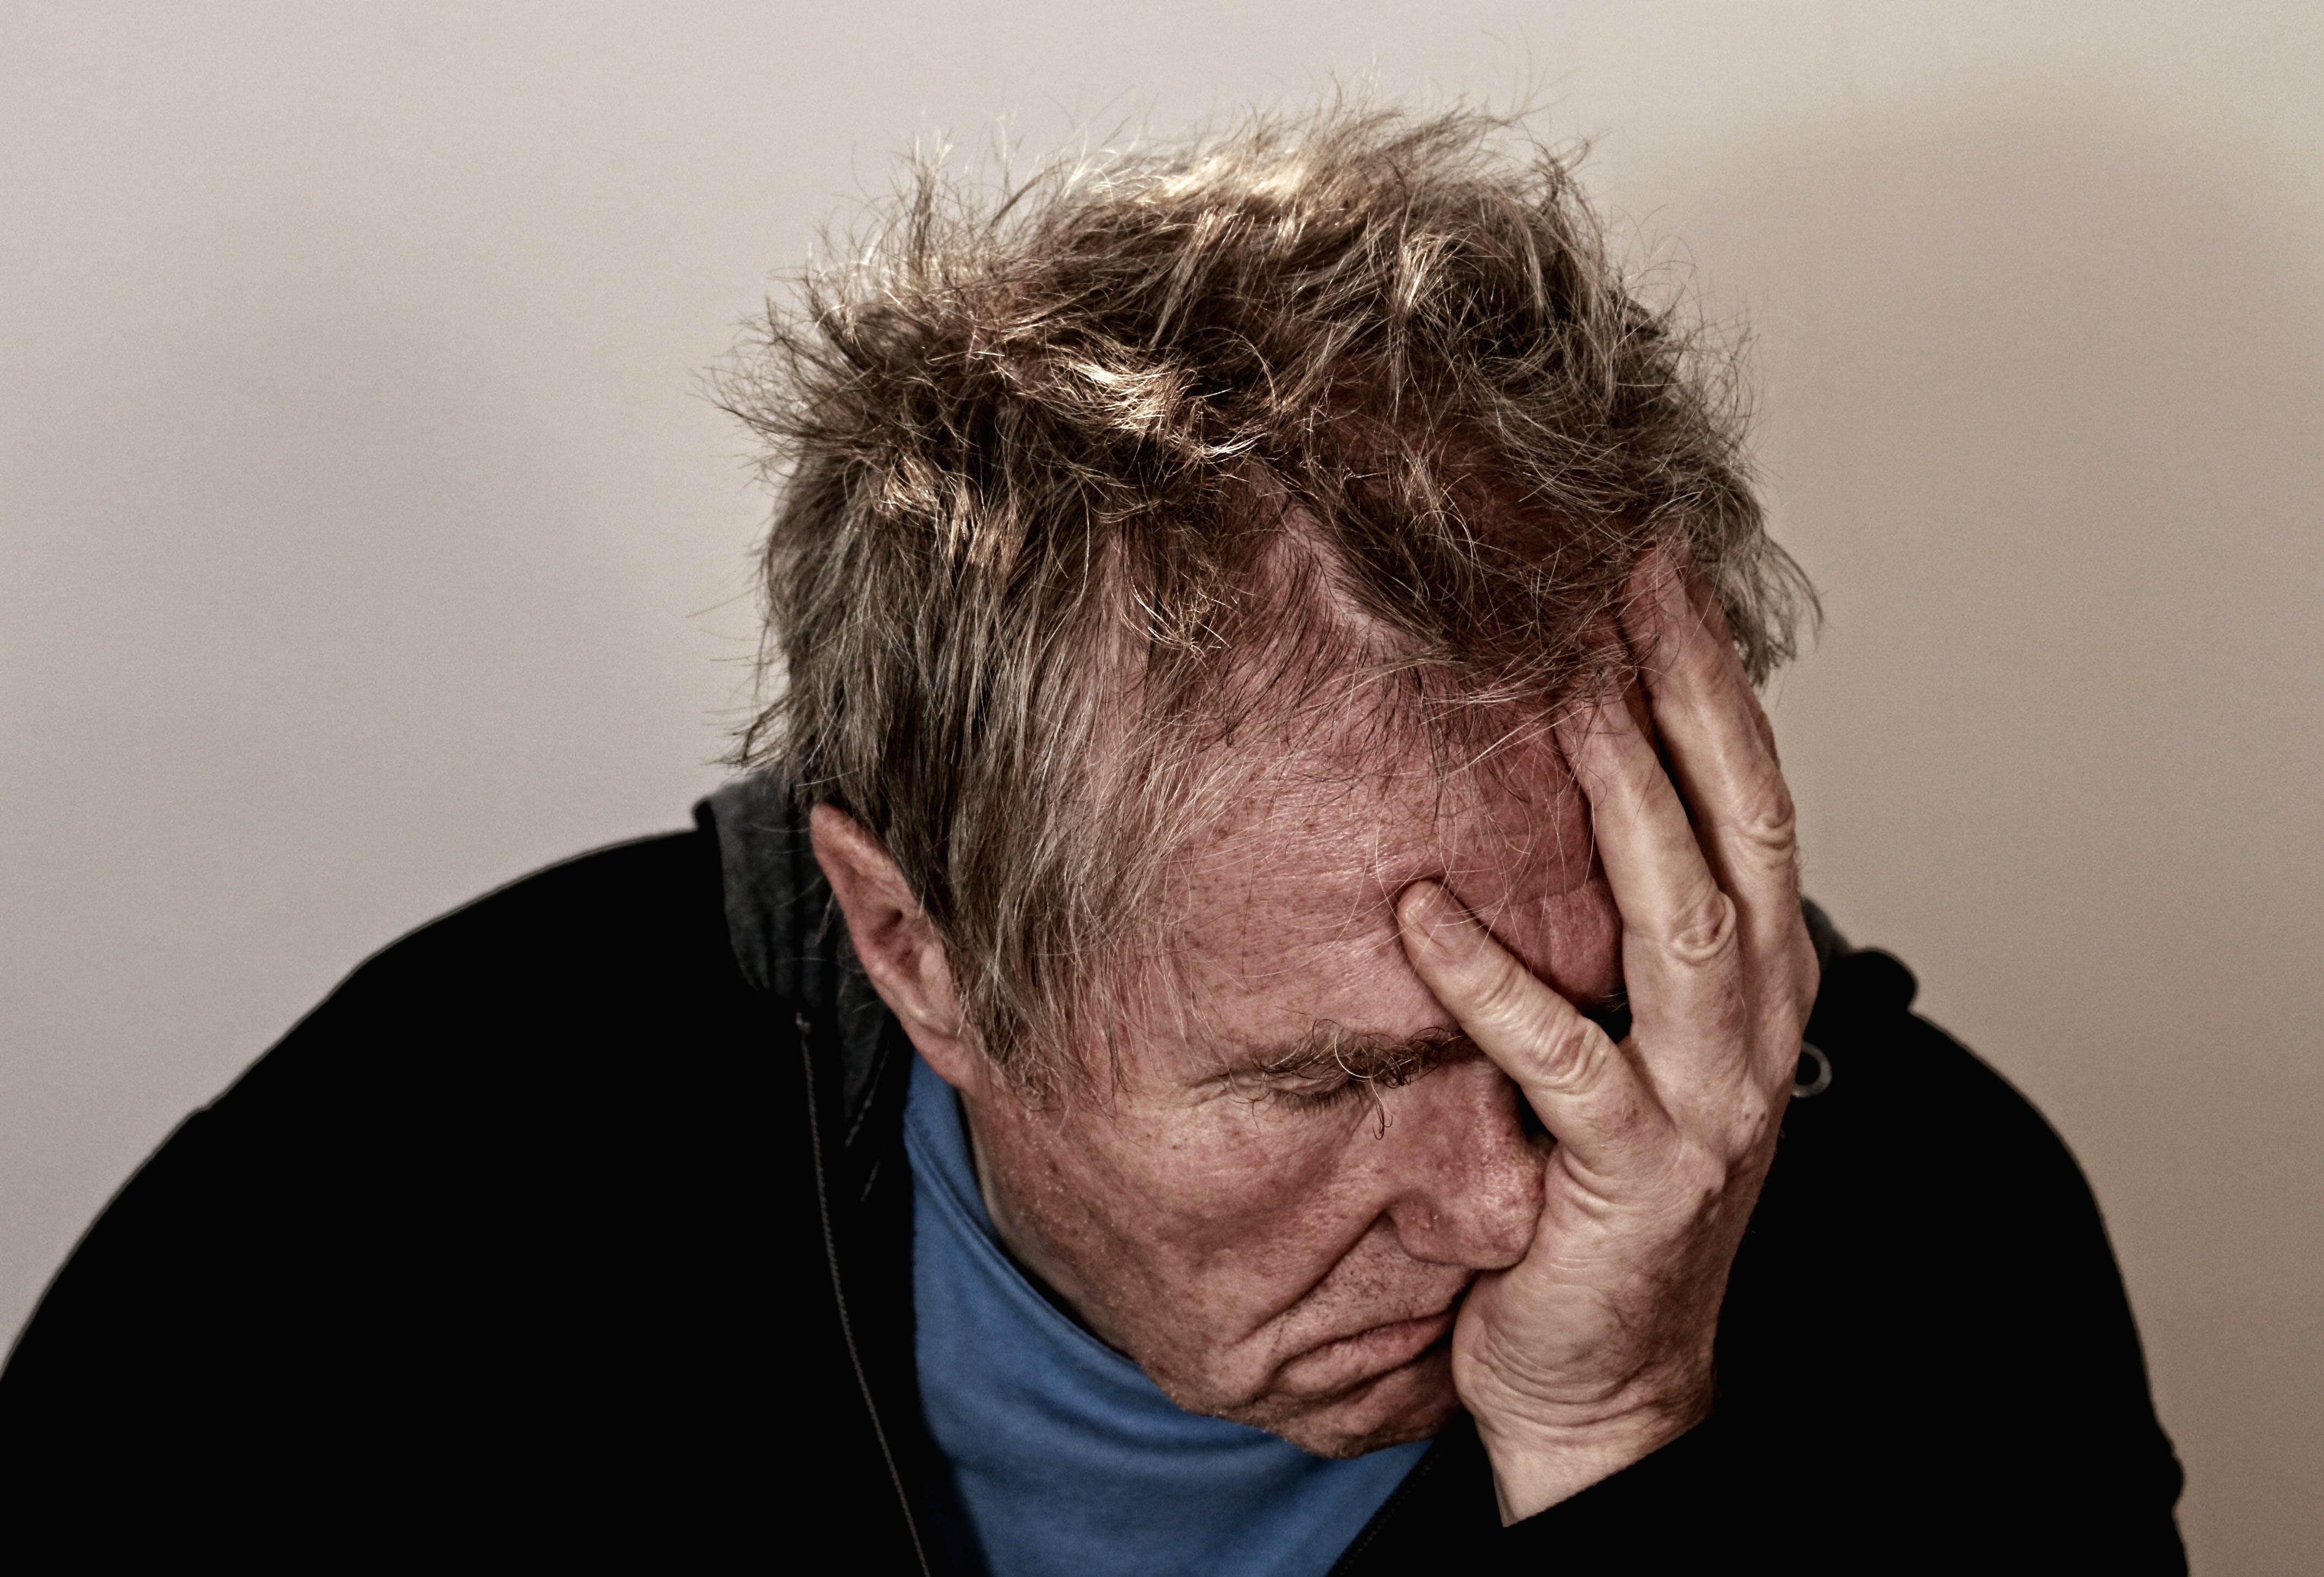 Free stock photo of man, heart, emotions, feelings